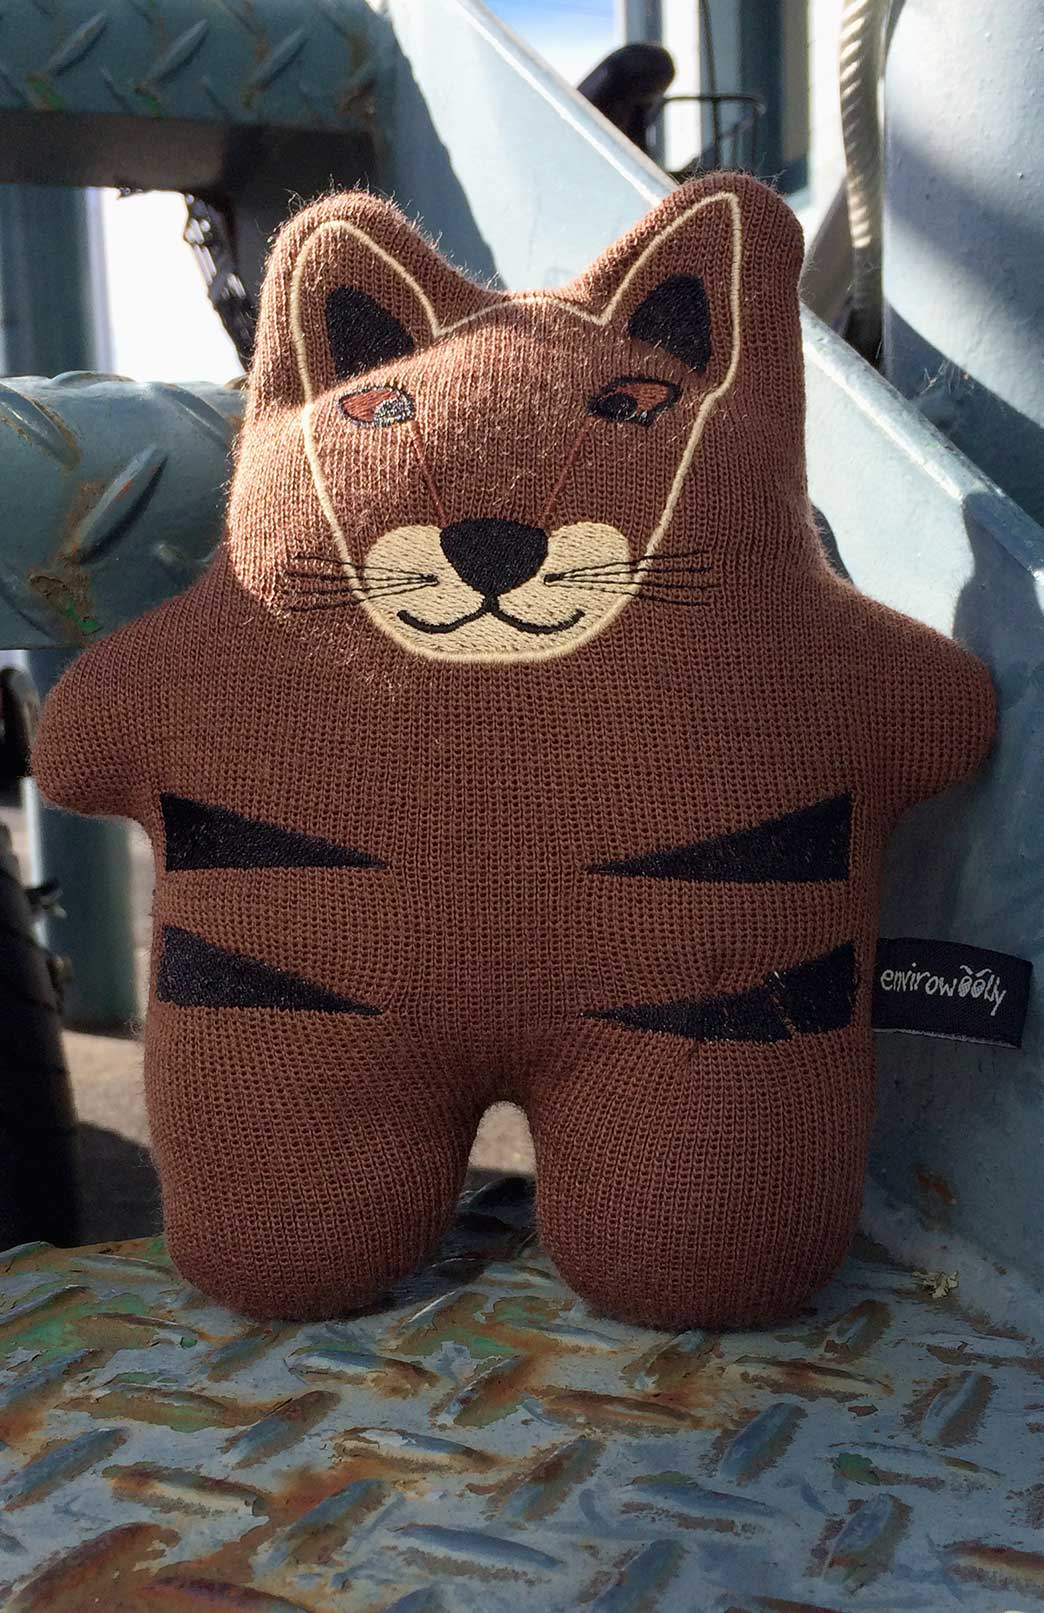 Envirowoolly - Children's Merino Wool Tasmanian Devil Soft Plush Toy - Smitten Merino Tasmania Australia